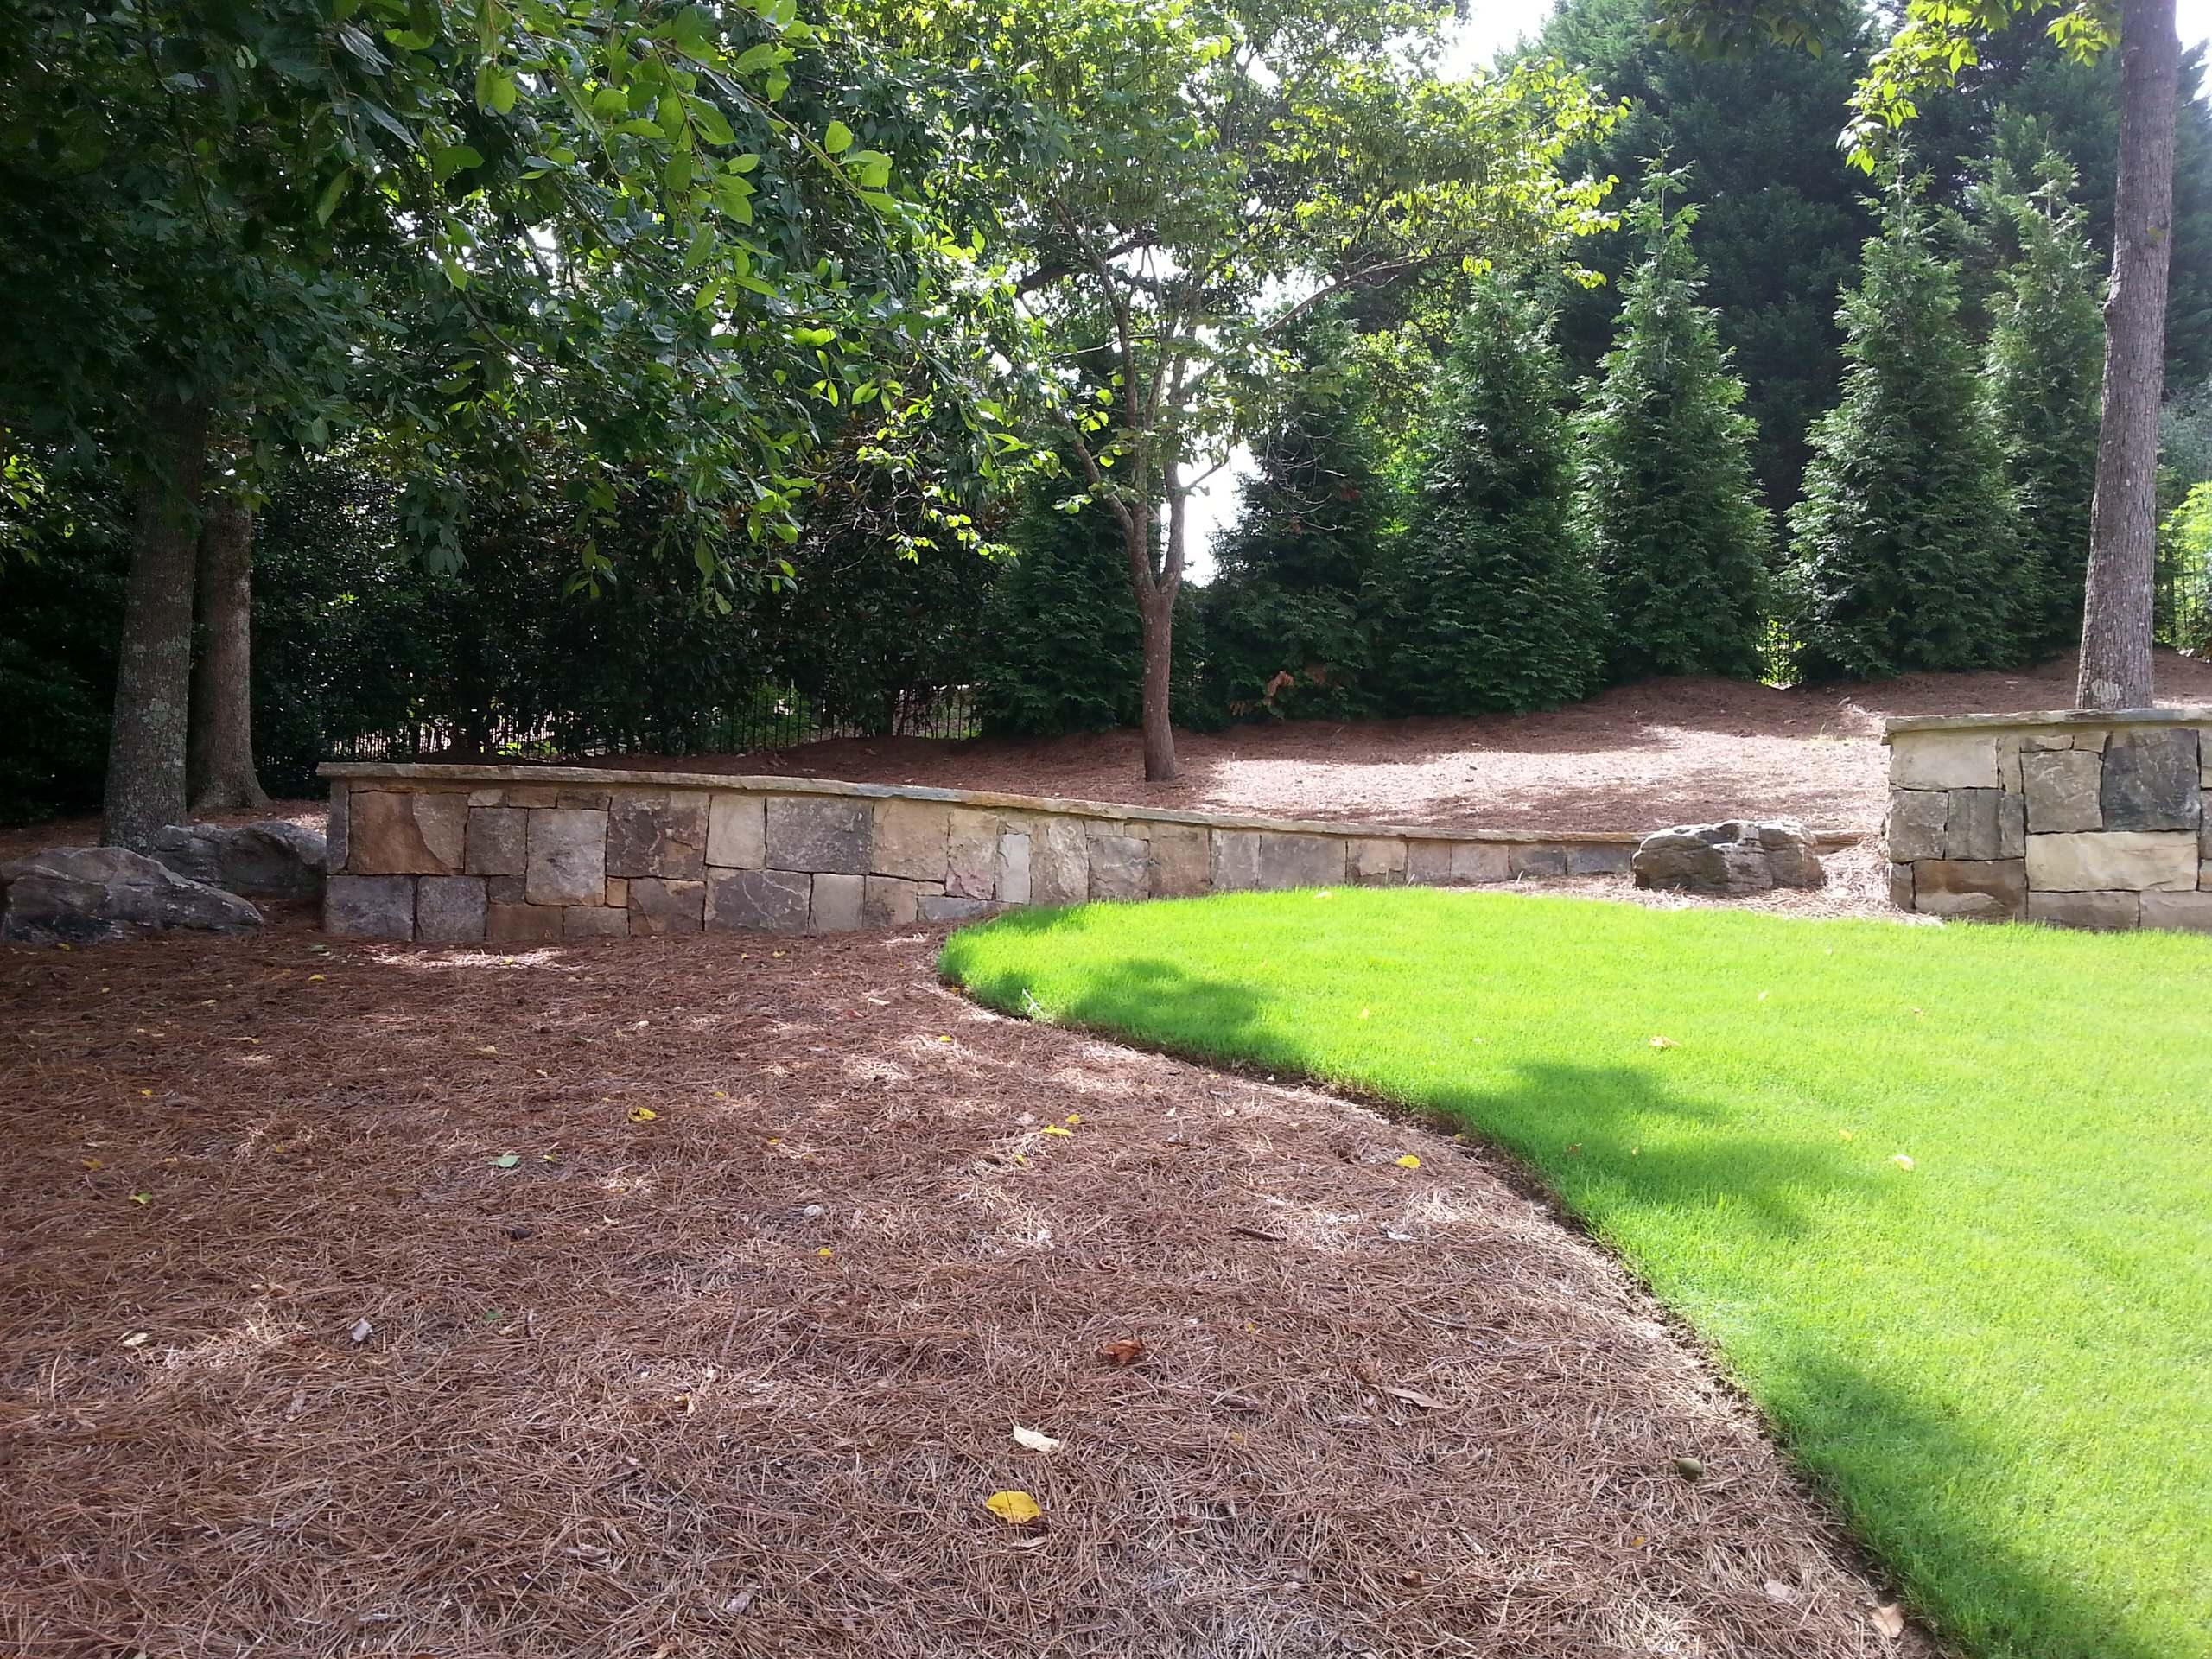 Multi-level stone retaining walls